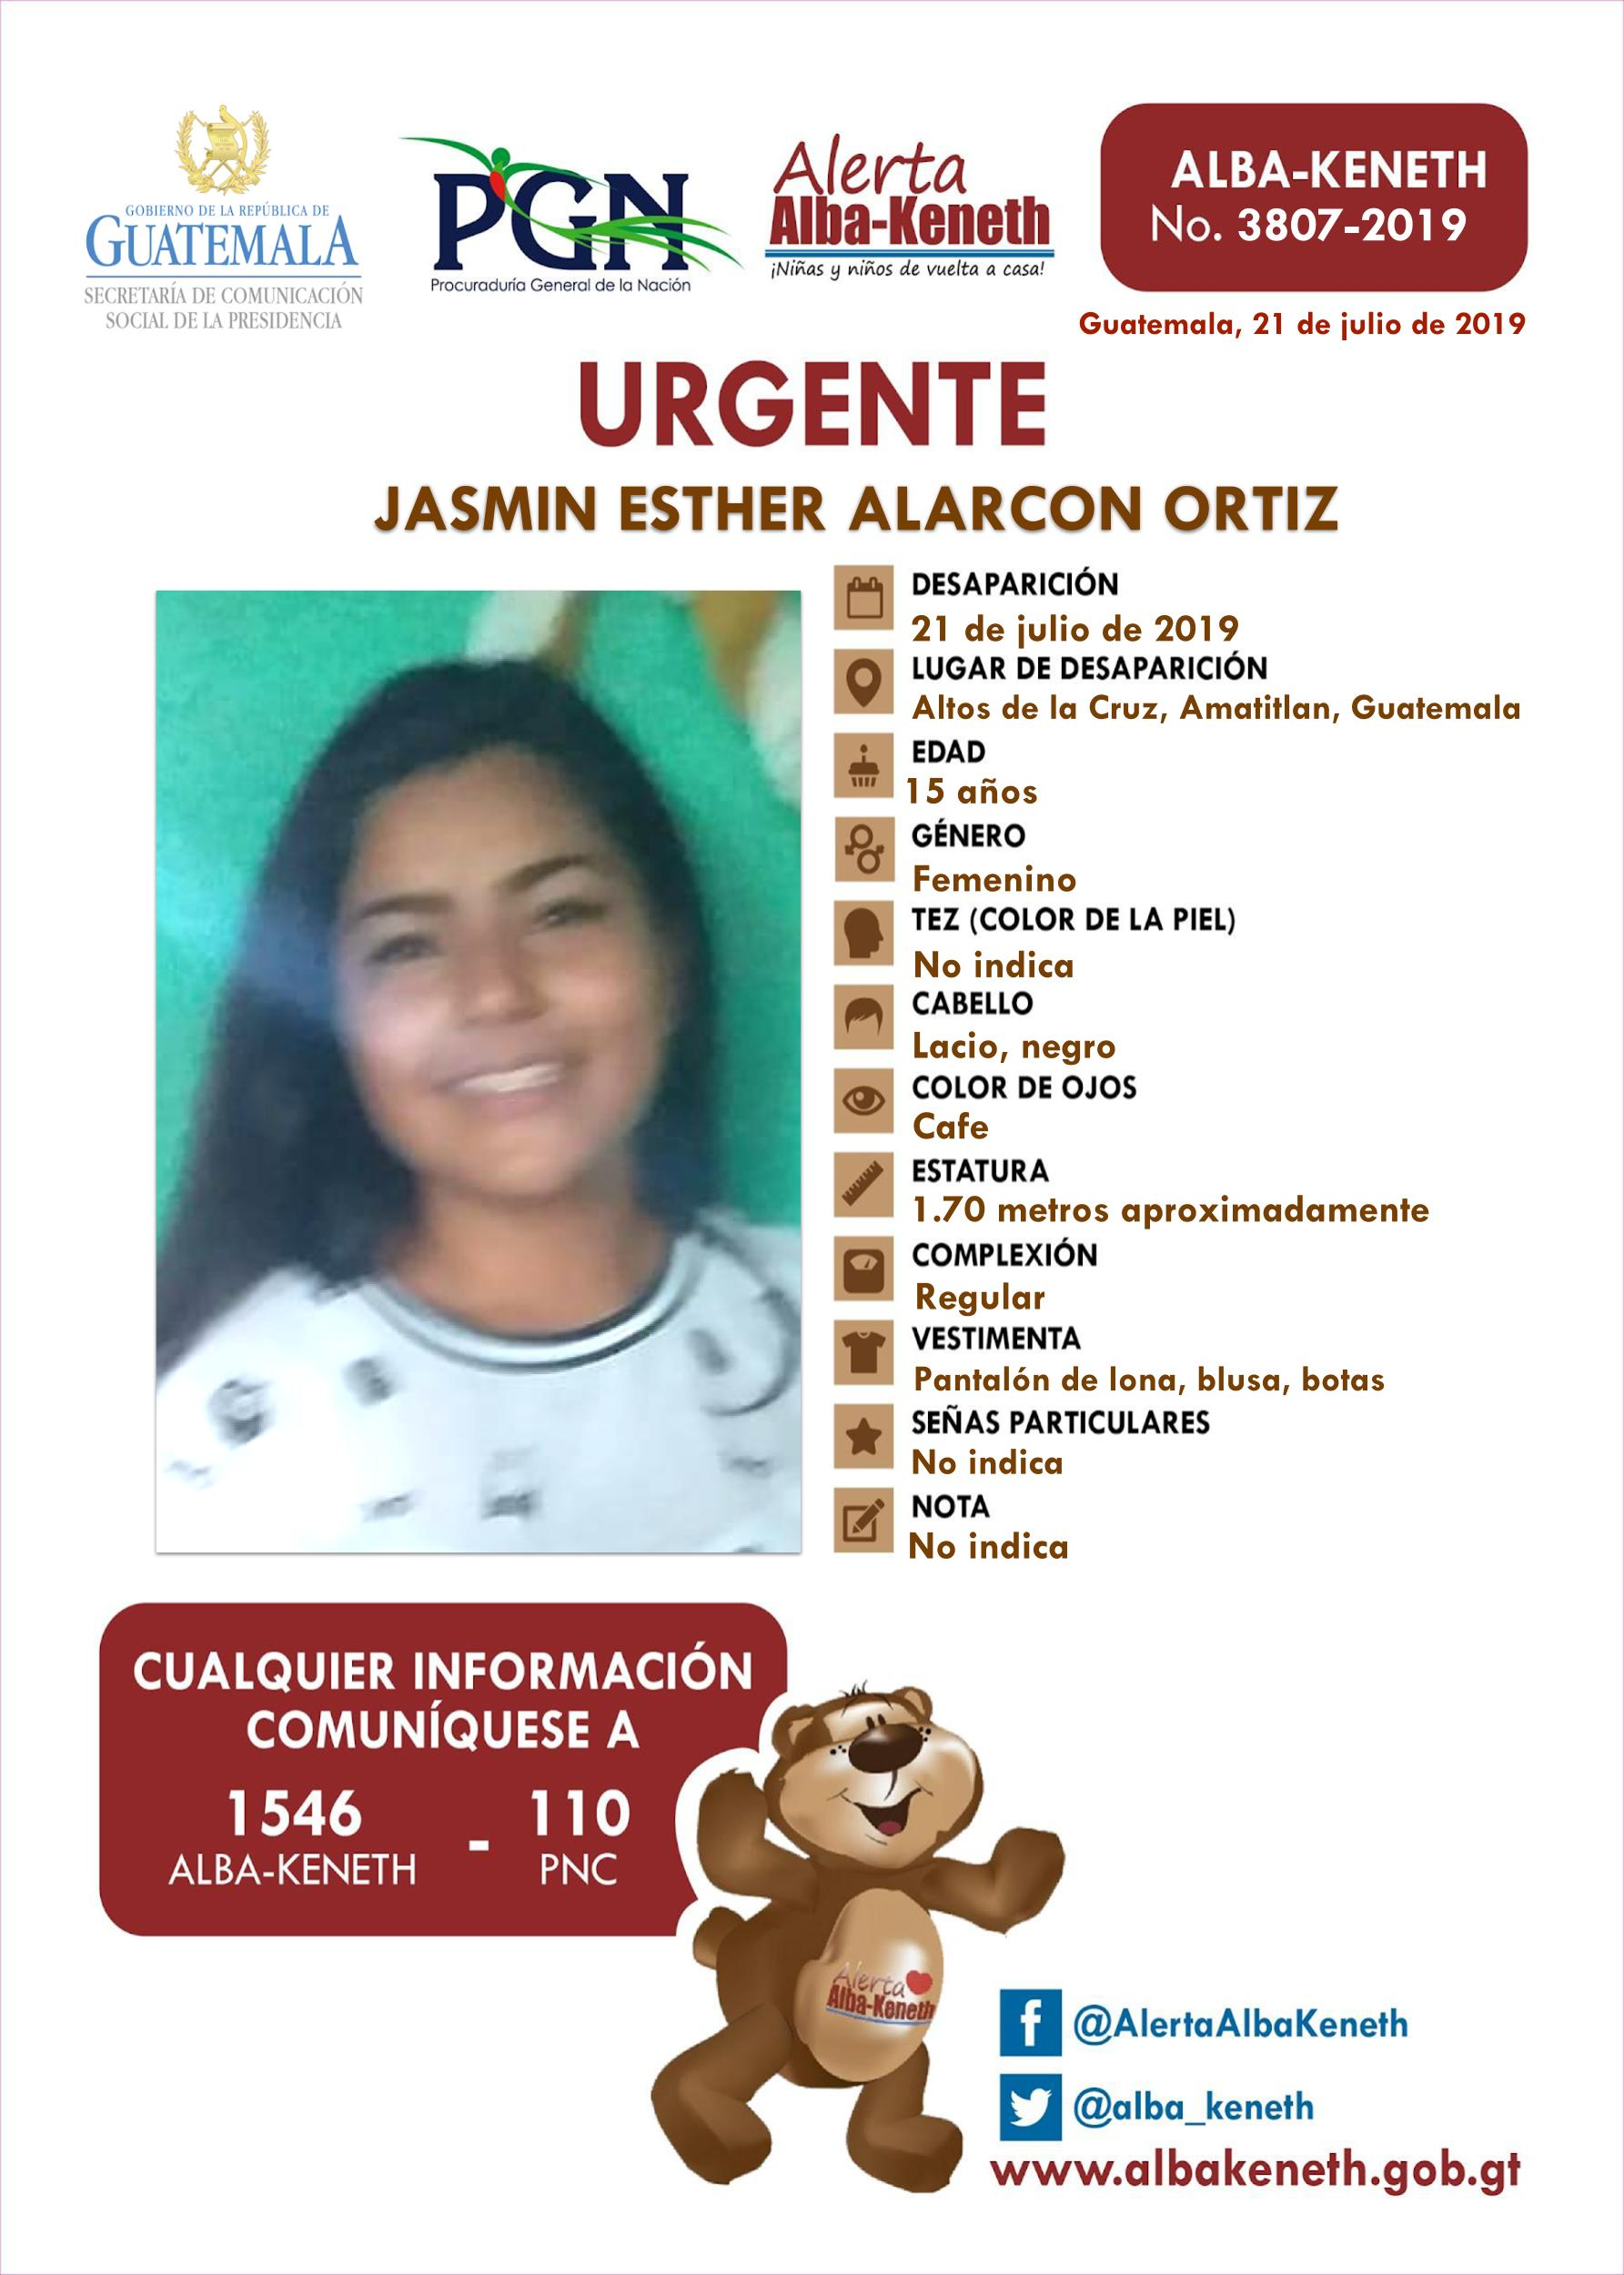 Jasmin Esther Alarcon Ortiz